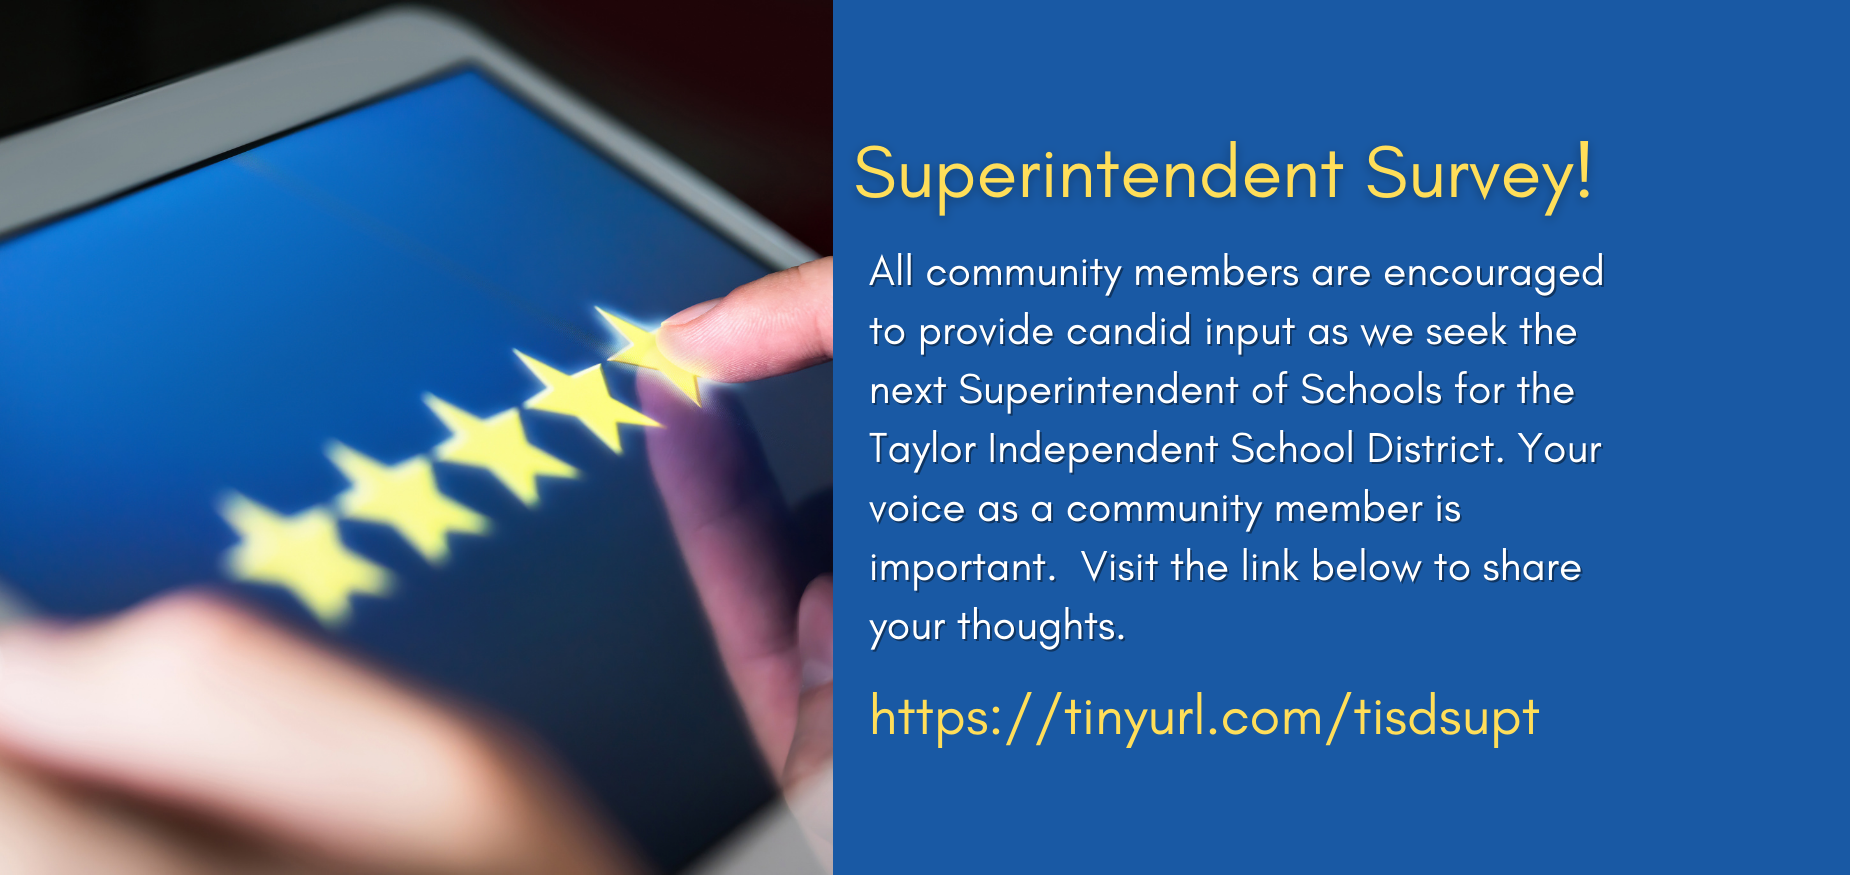 Superintendent Survey Link